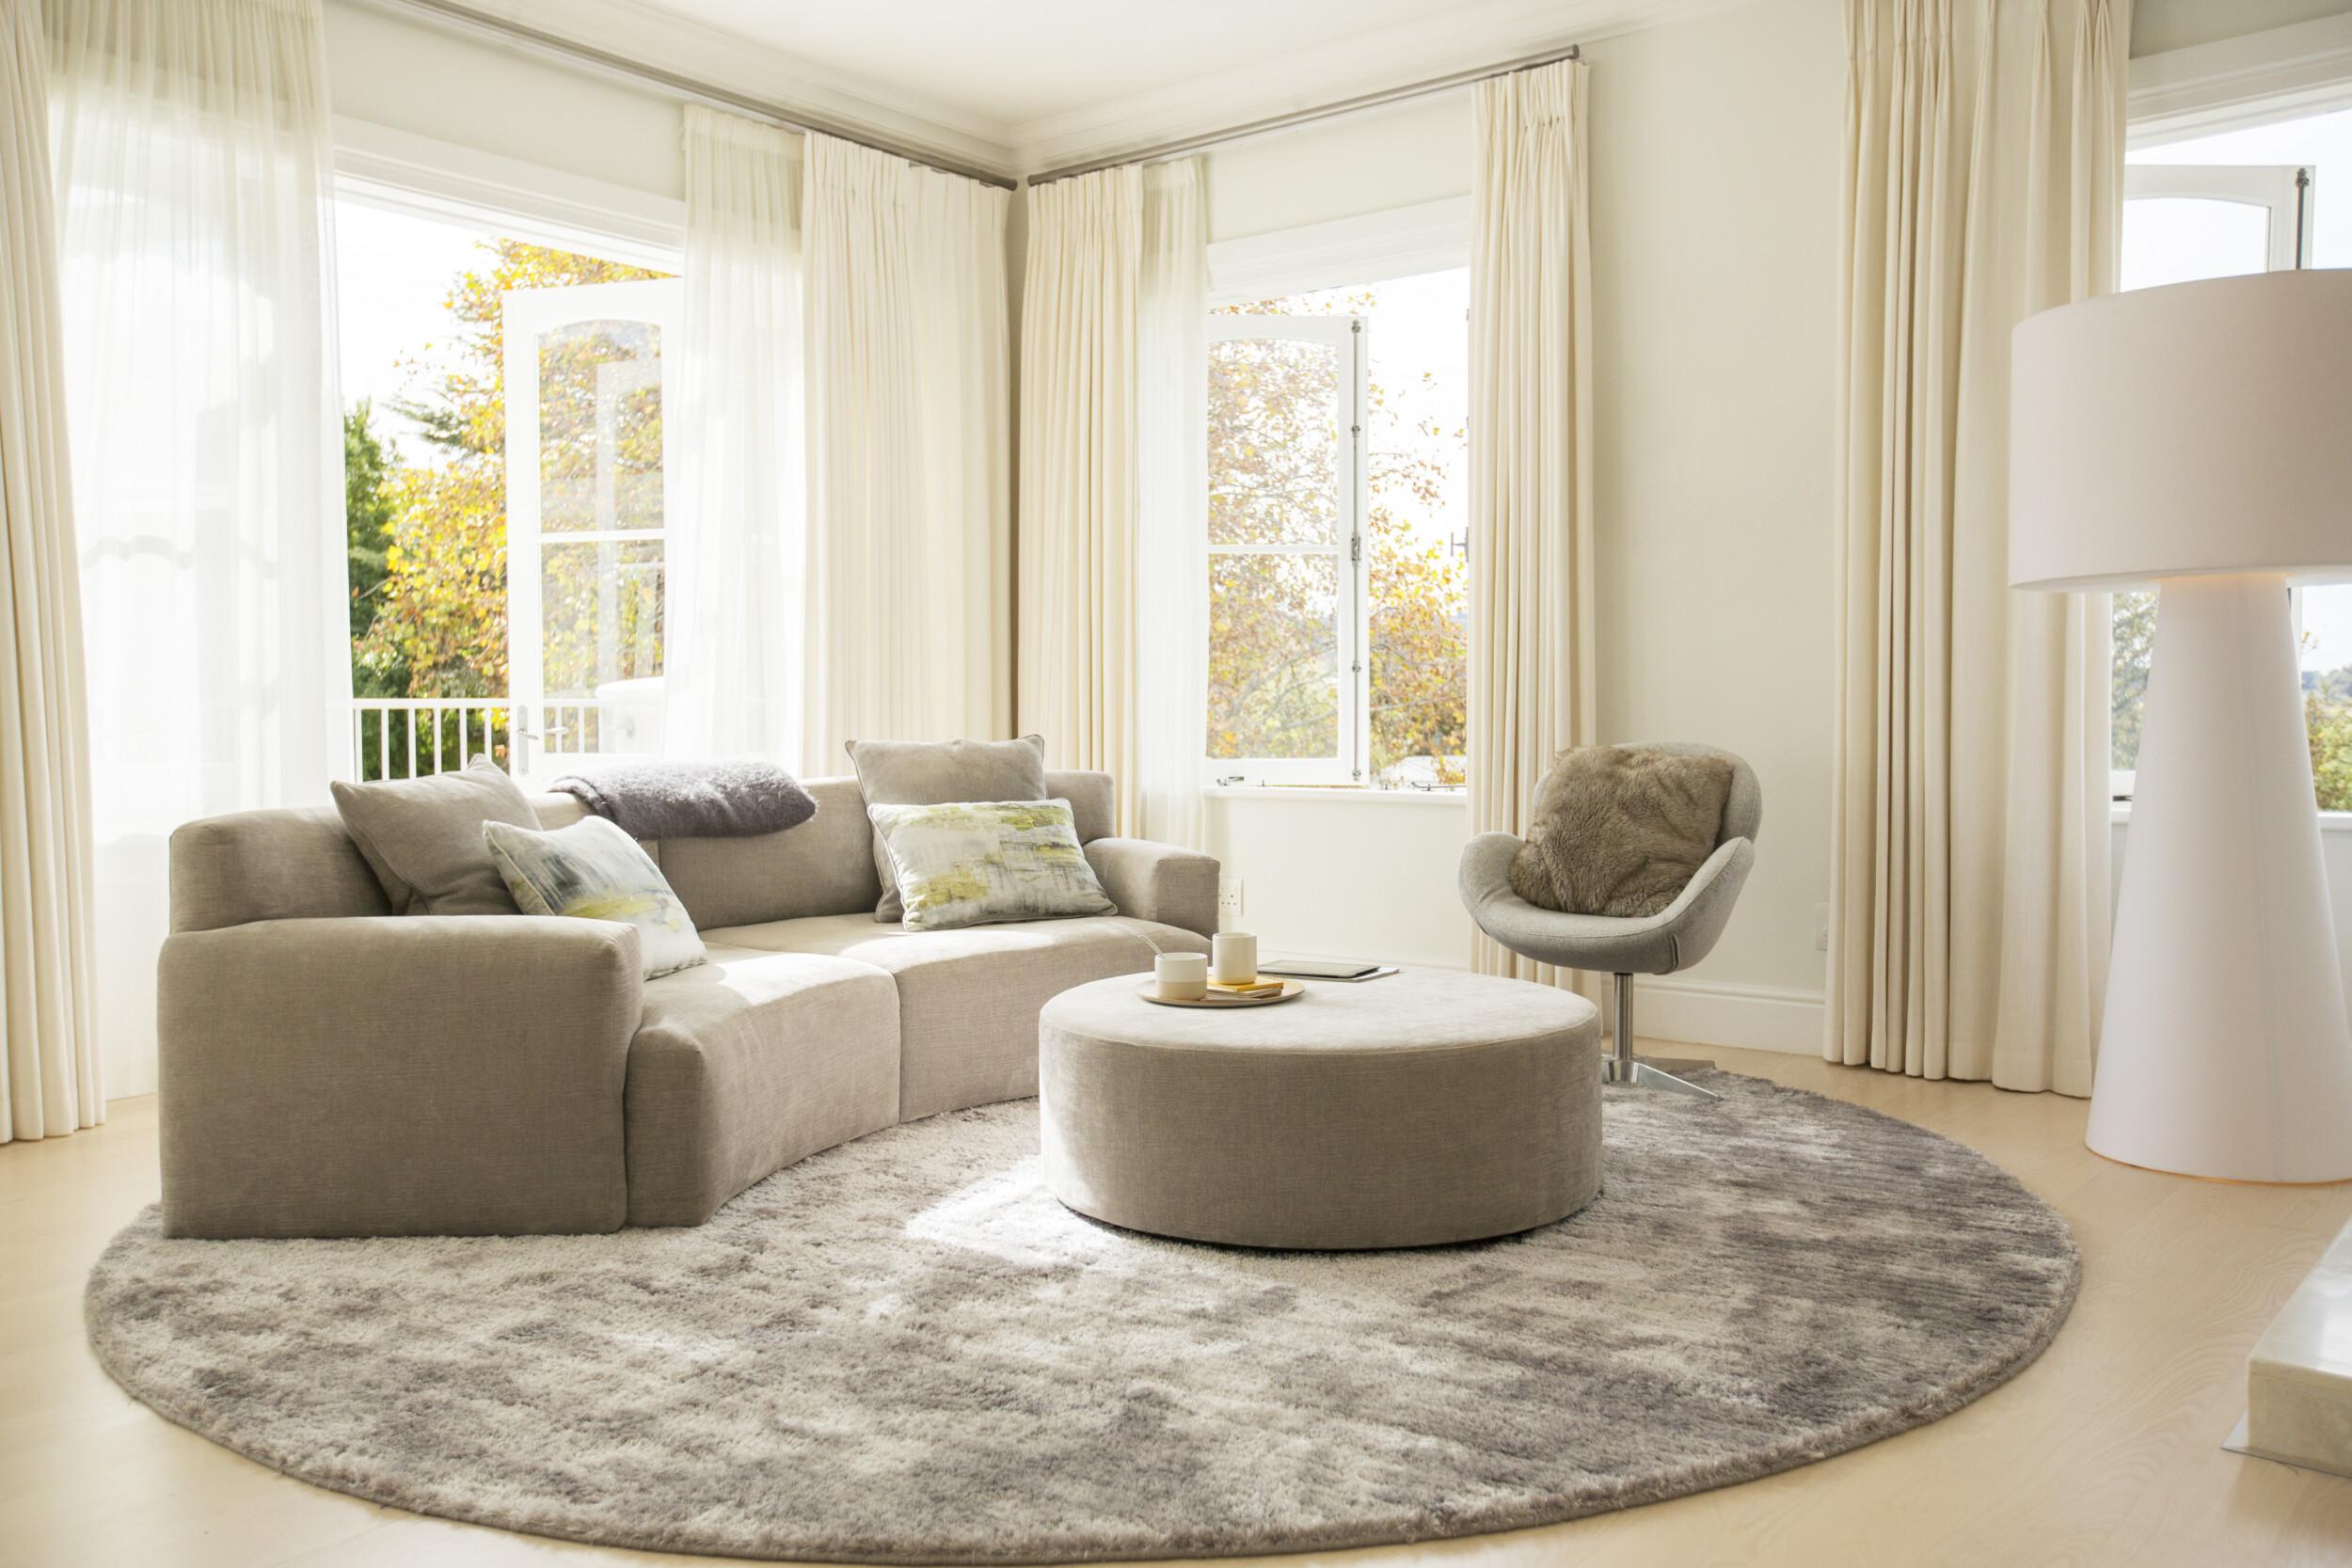 curved sofa modern living room